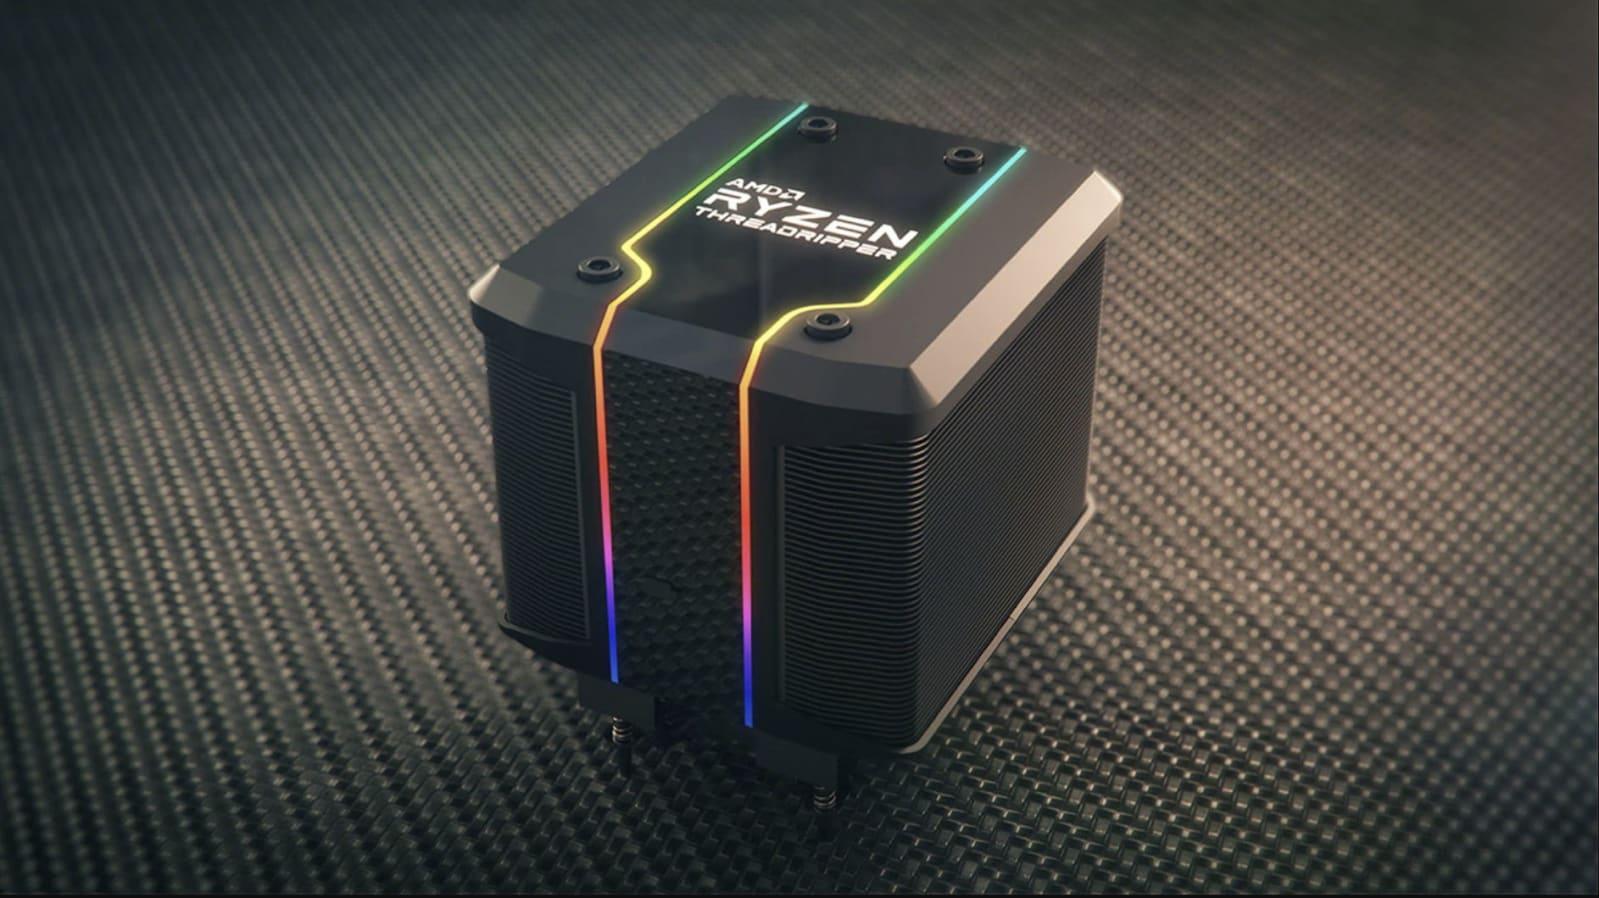 AMD Ryzen Threadripper 3990X 64-core CPU